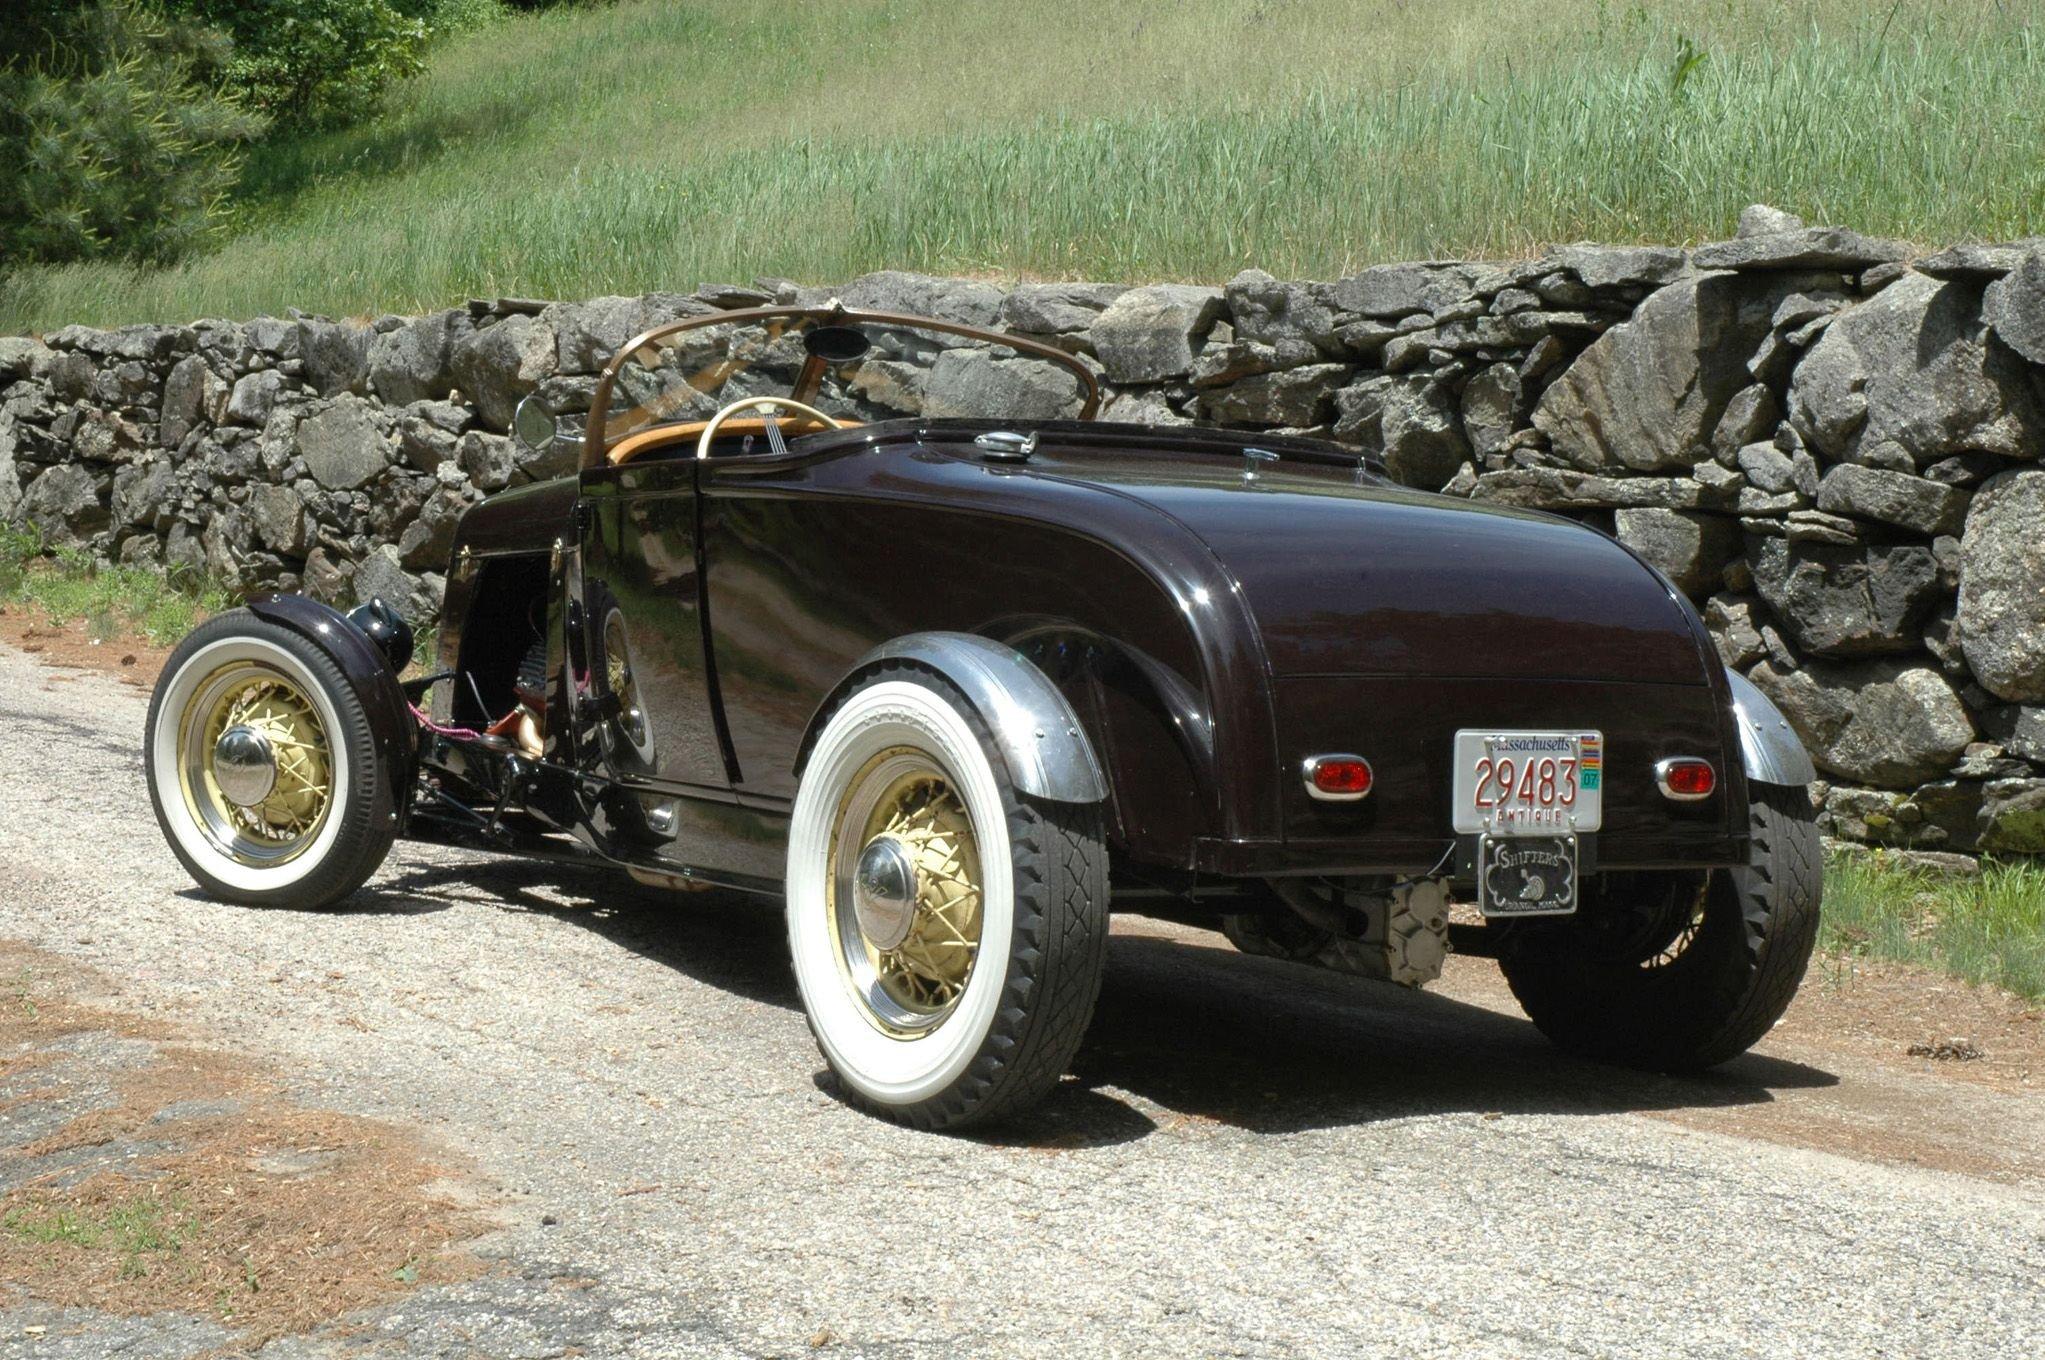 1929 Ford Model A Roadster-02 wallpaper